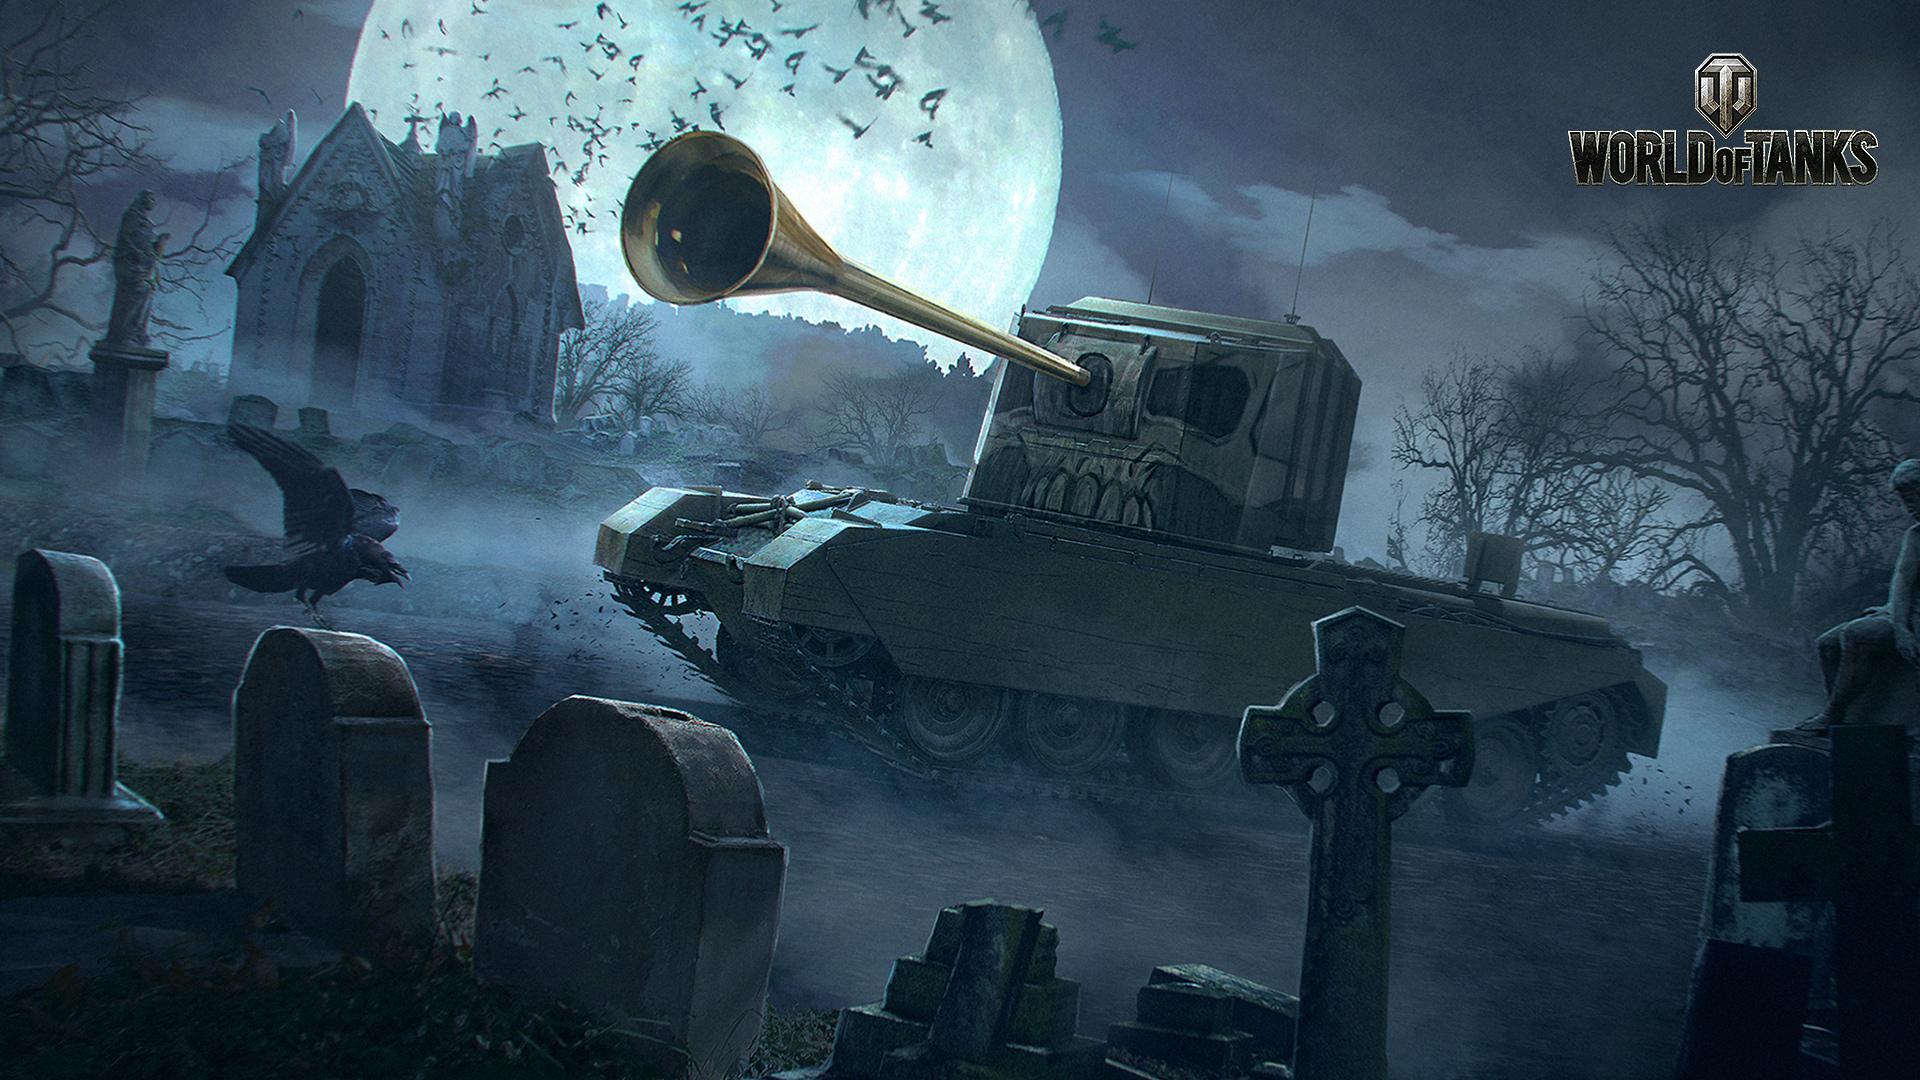 Halloween Special 2018: Wallpaper of Doom! | Tanks: World of Tanks media, best videos and artwork